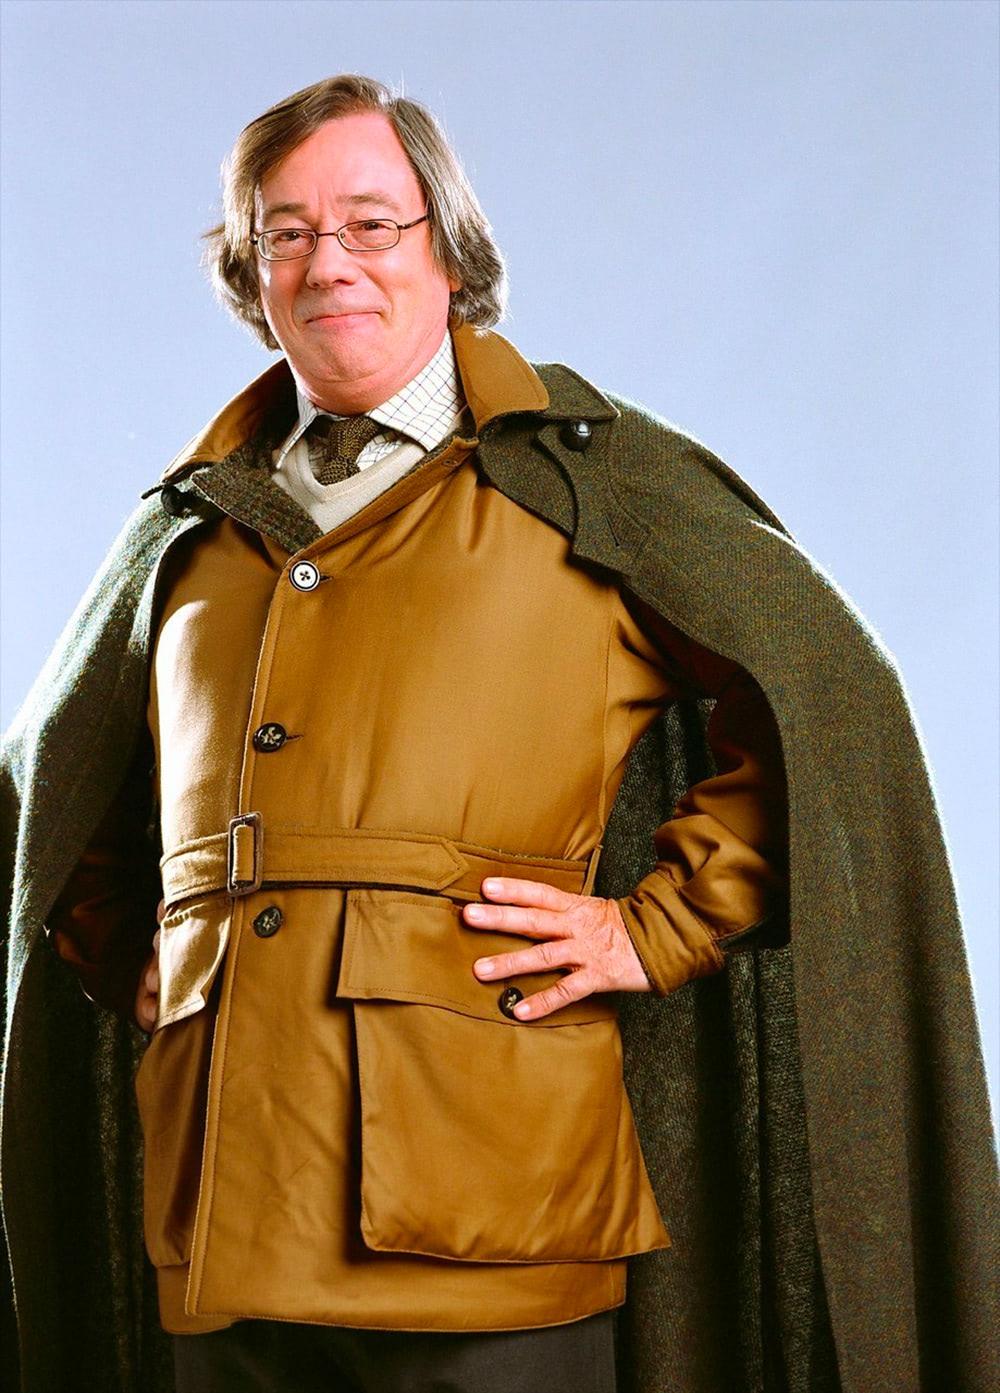 Portrait of Amos Diggory